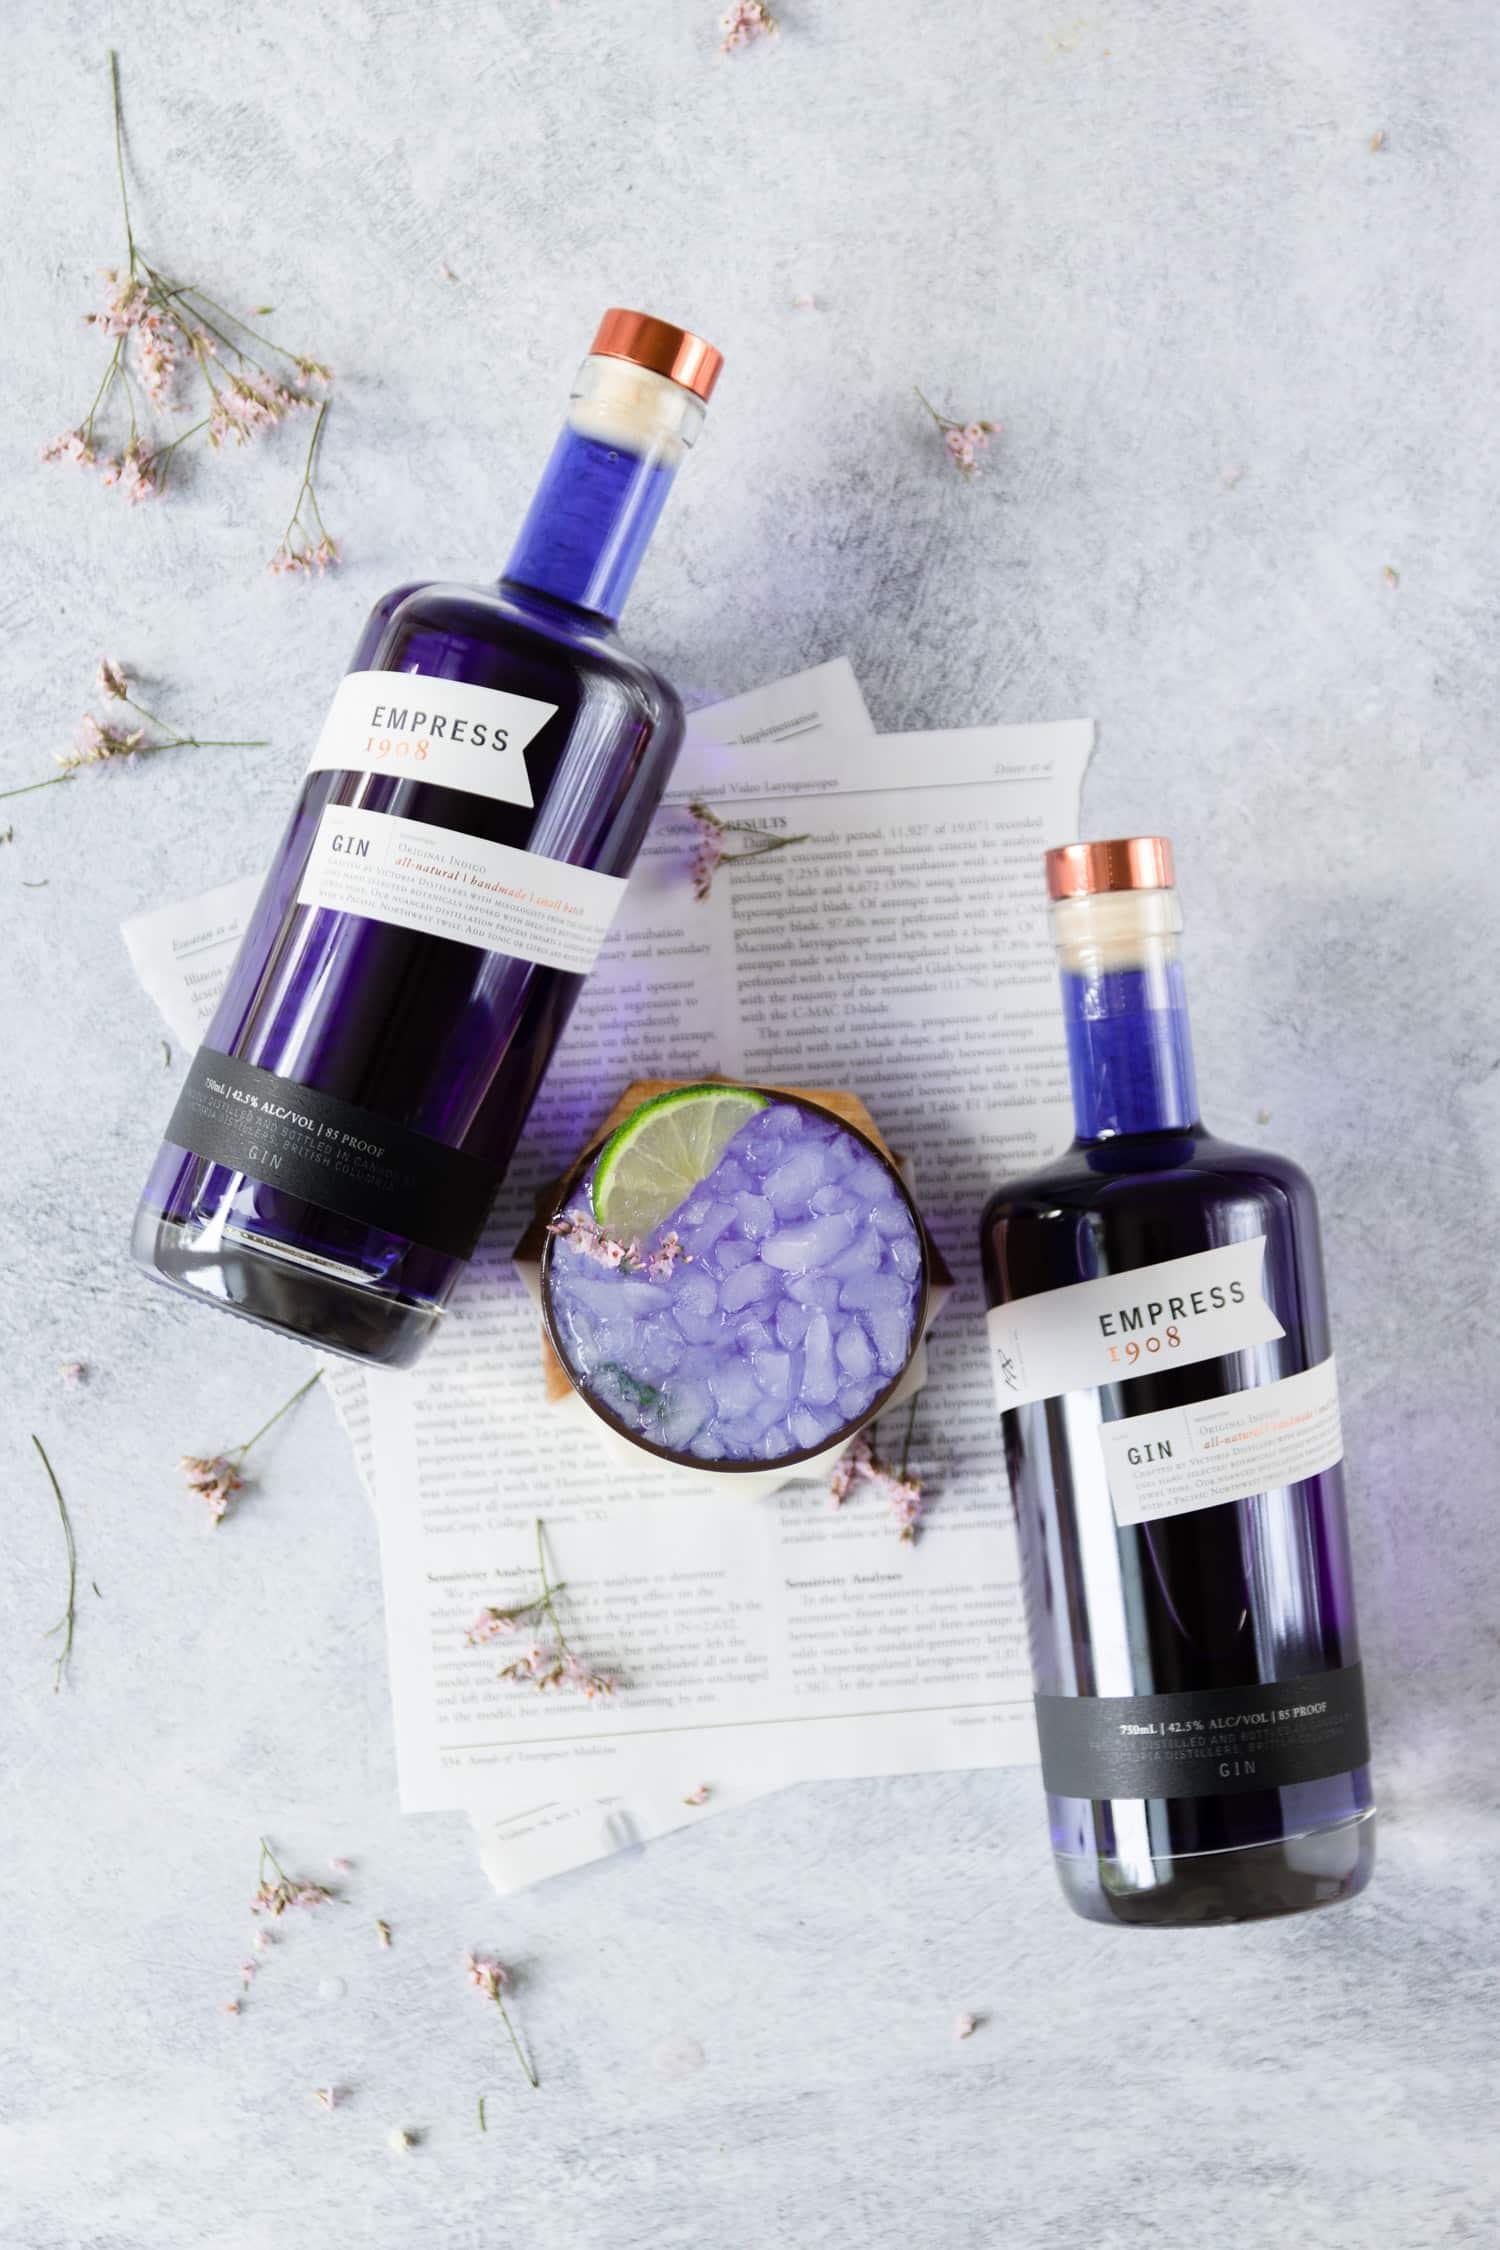 empress gin 1 jmeyering creative - J.Meyering Creative